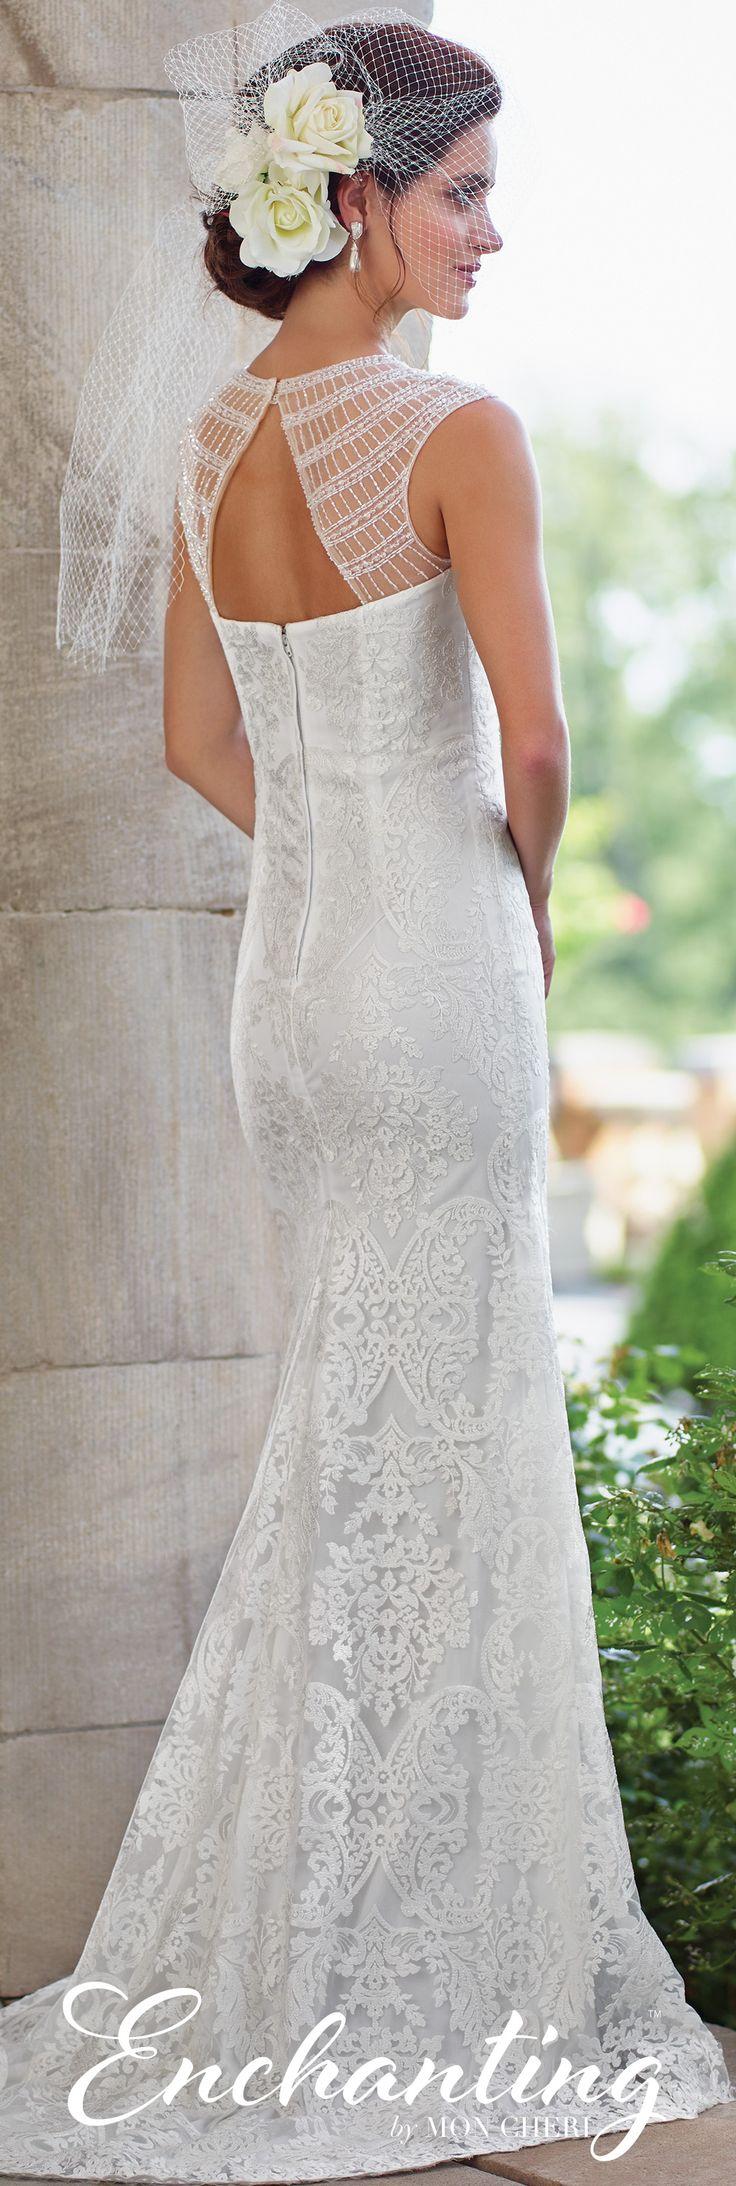 8 best Wedding Dresses or Evening Gowns images on Pinterest   Disney ...